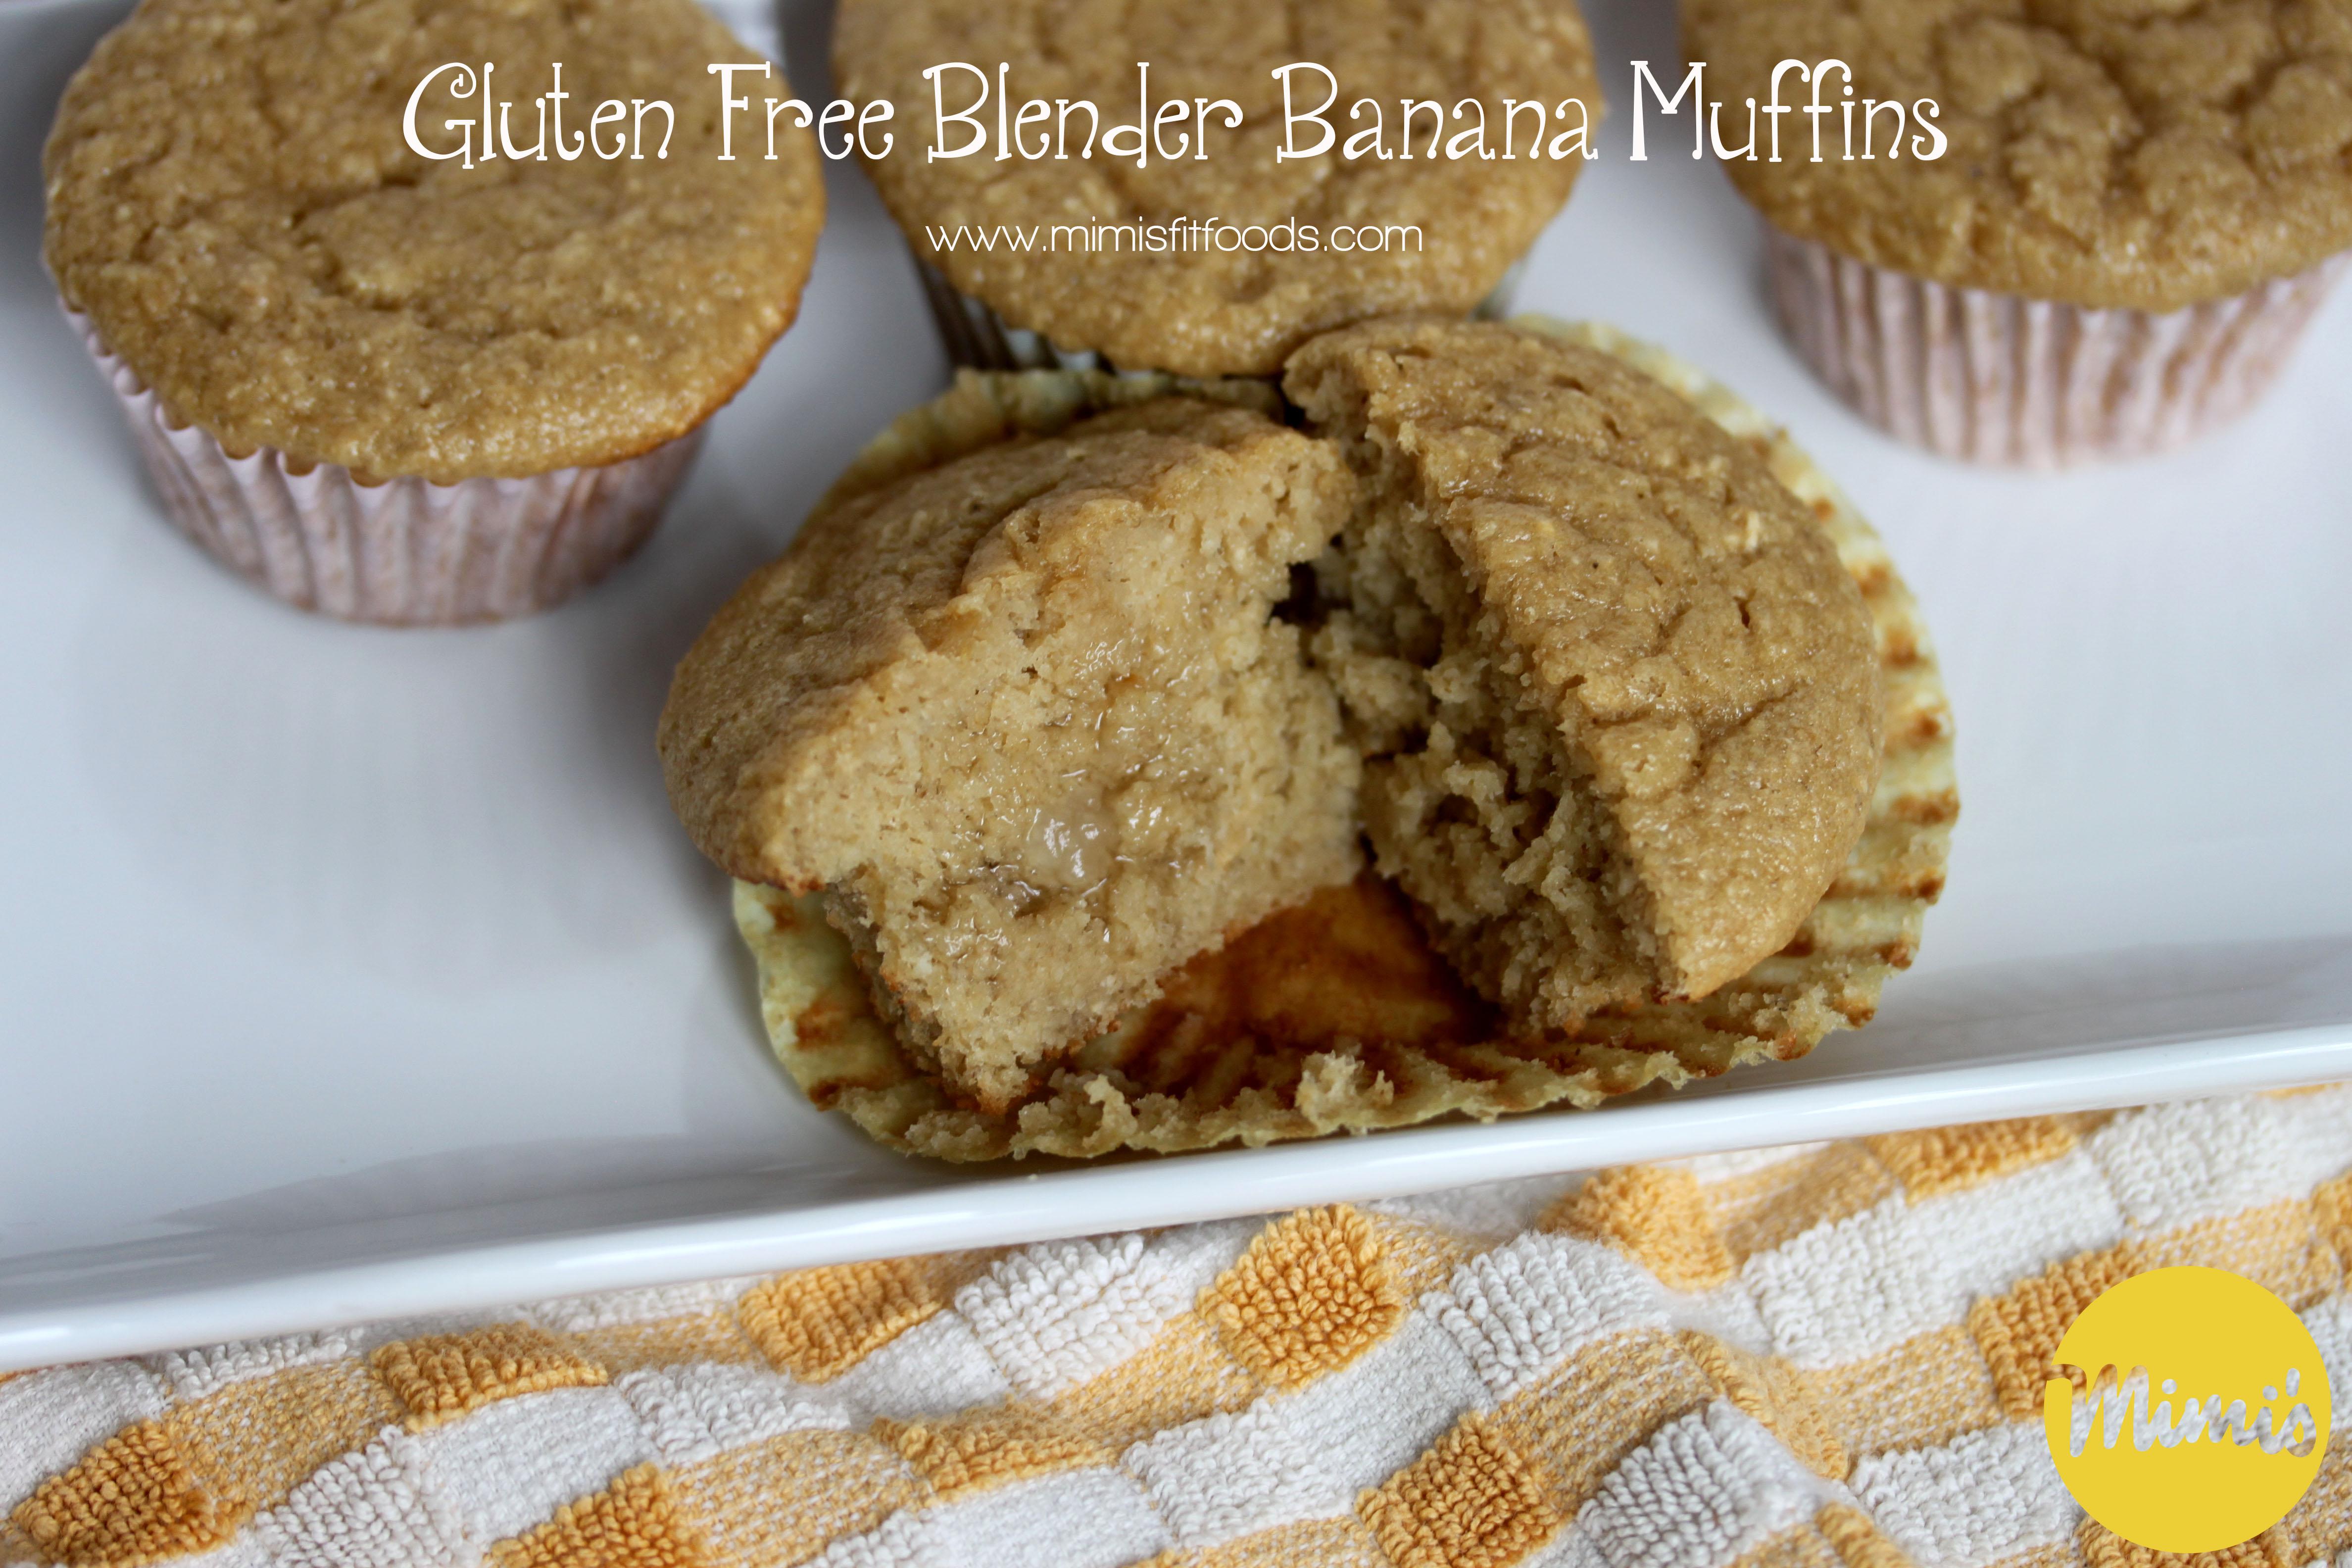 Gluten Free Blender Banana Muffins | Mimi's Fit Foods